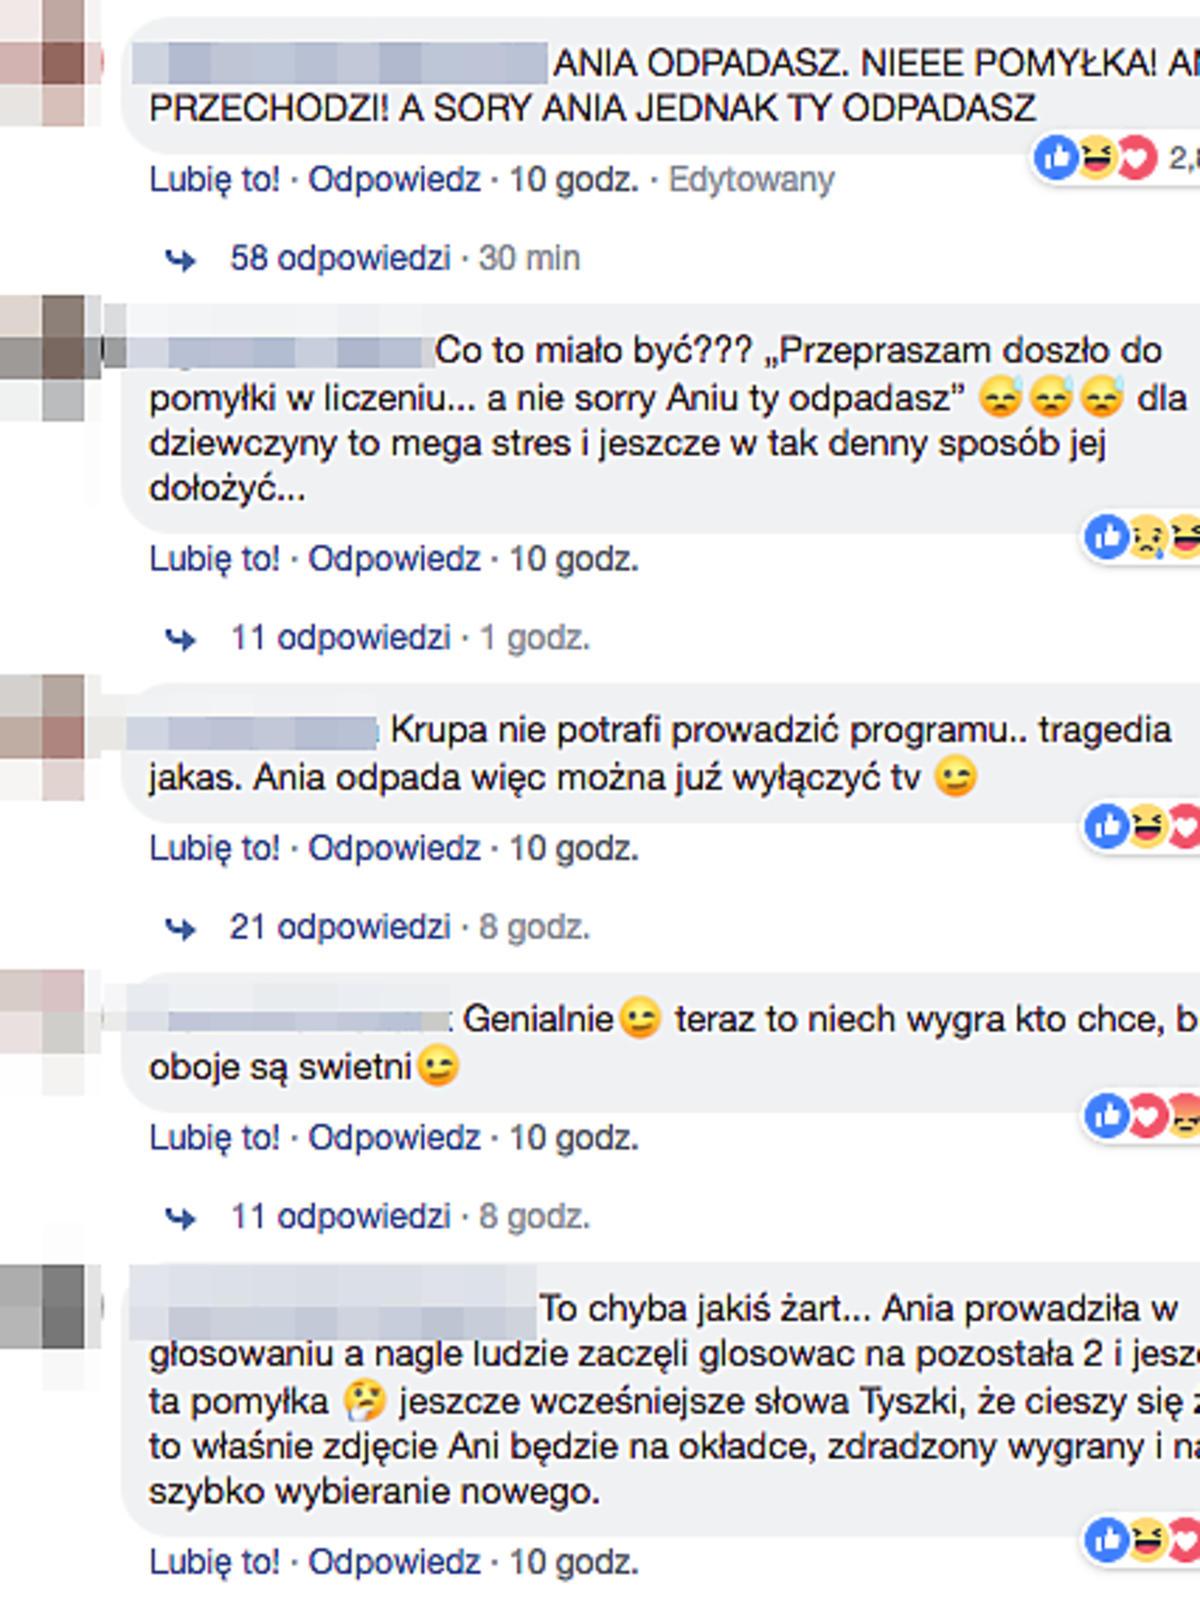 Komentarze Top Model Facebook